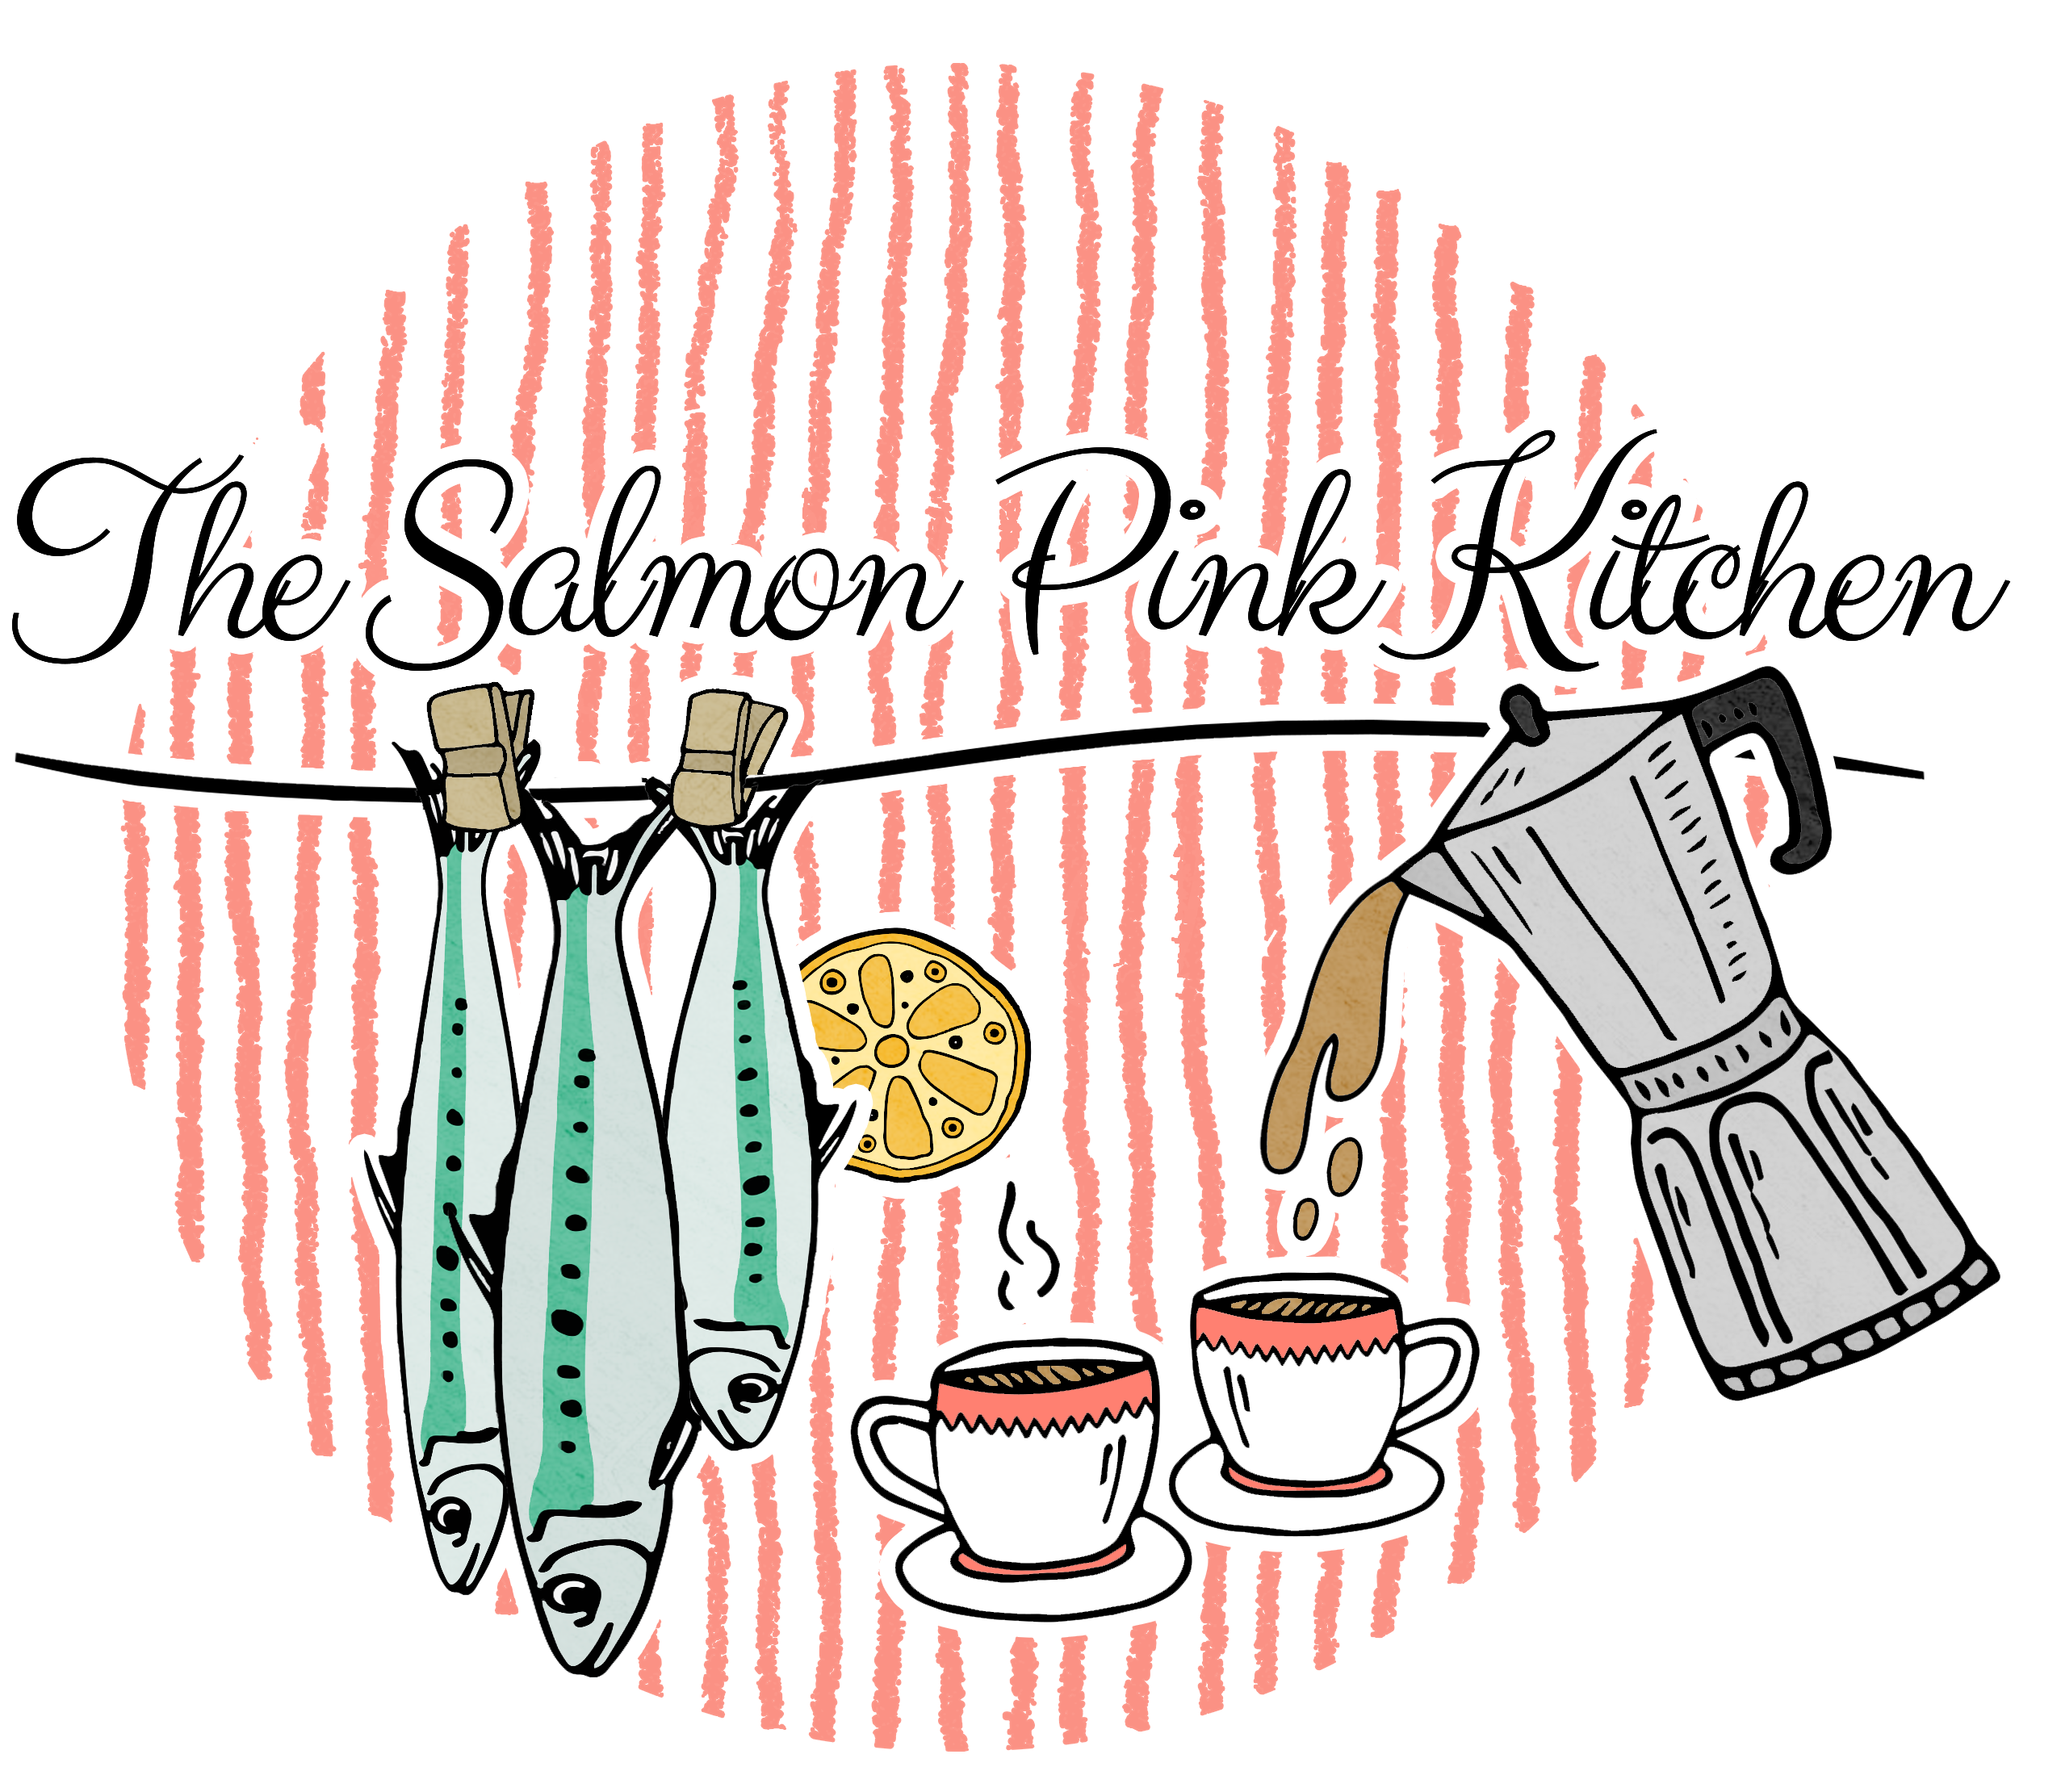 The Salmon Pink Kitchen